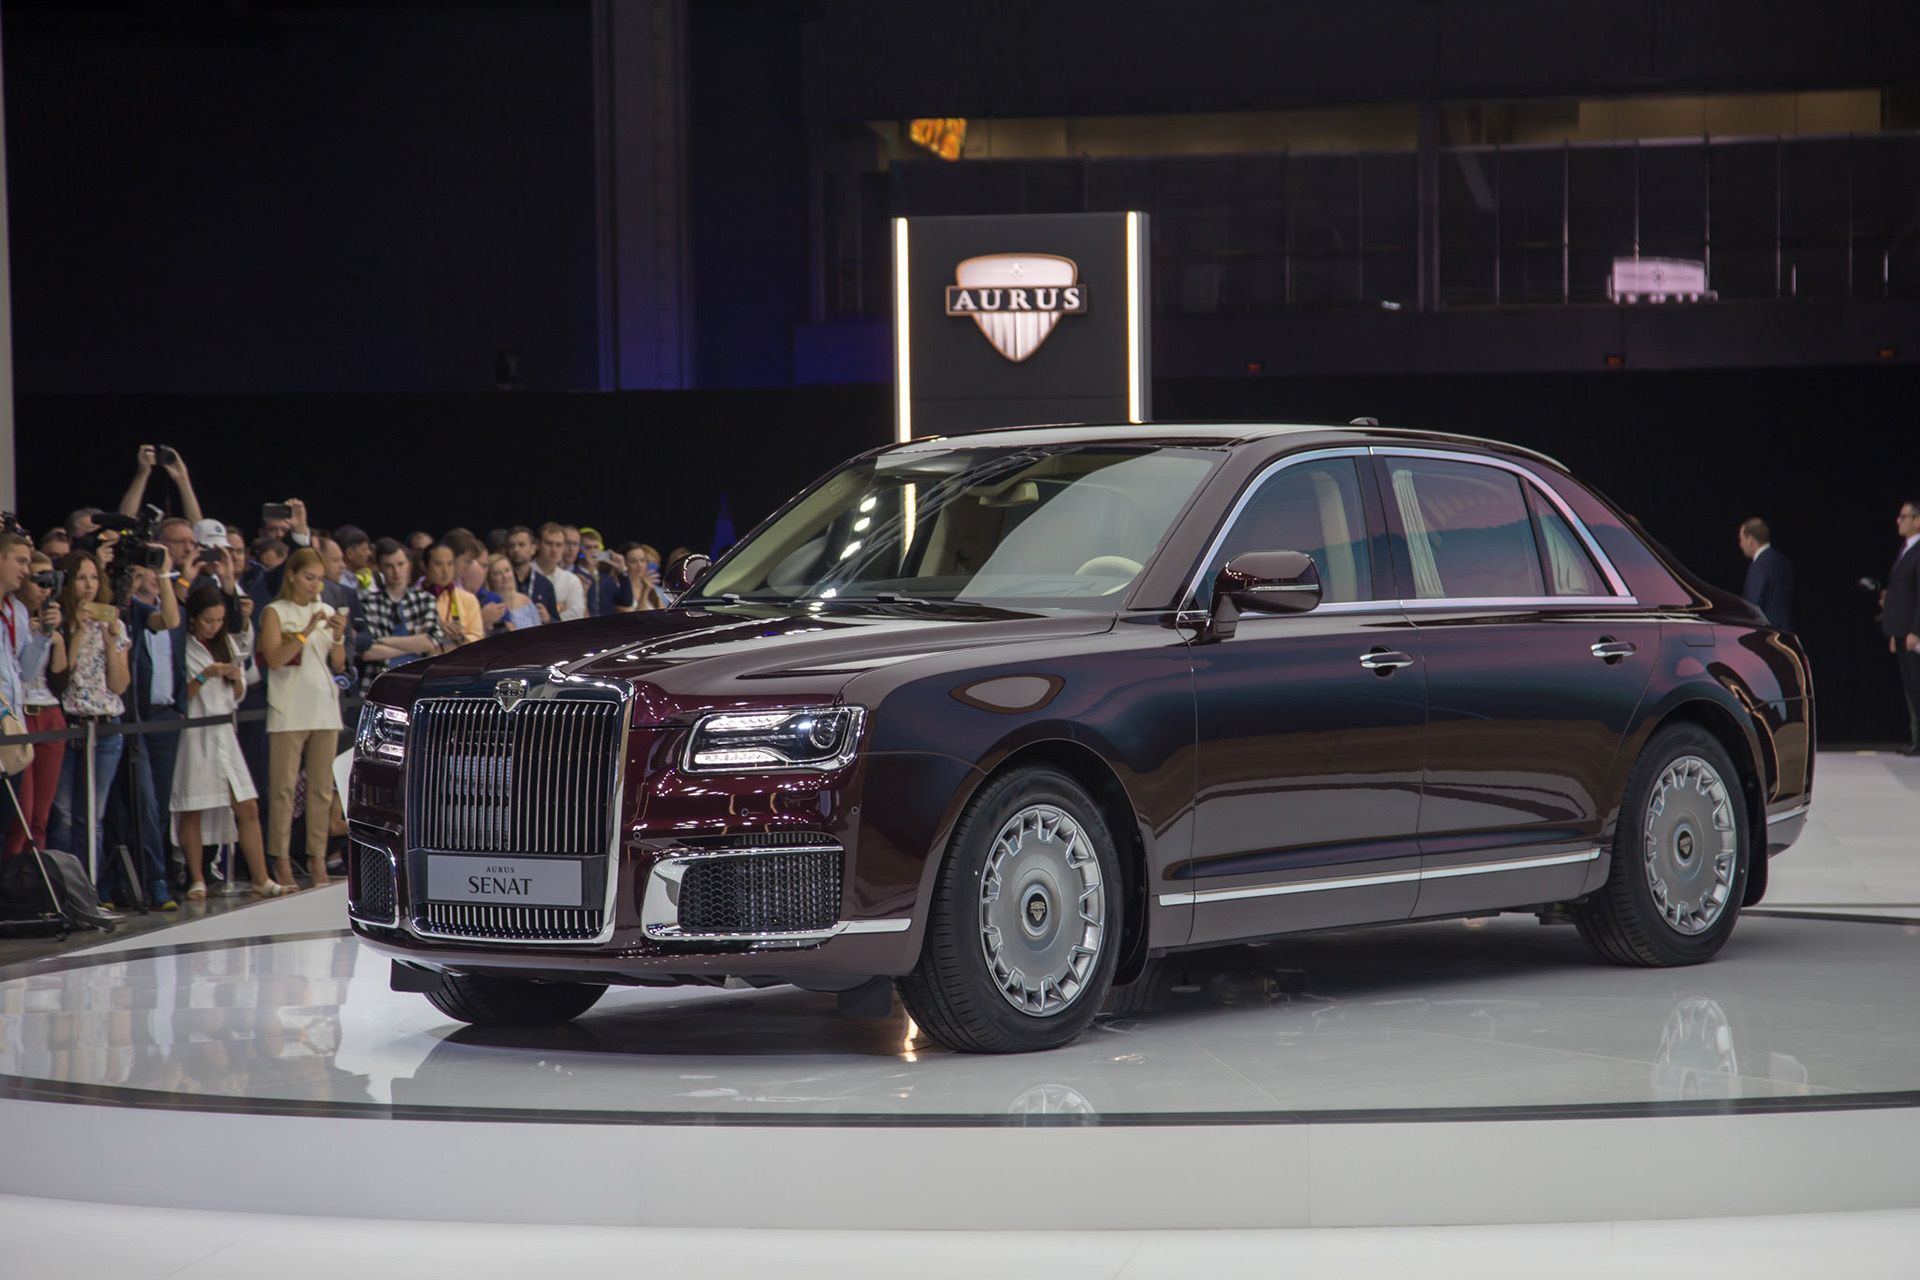 Aurus Senat: Vladimir Putin's New Presidential Limousine 3